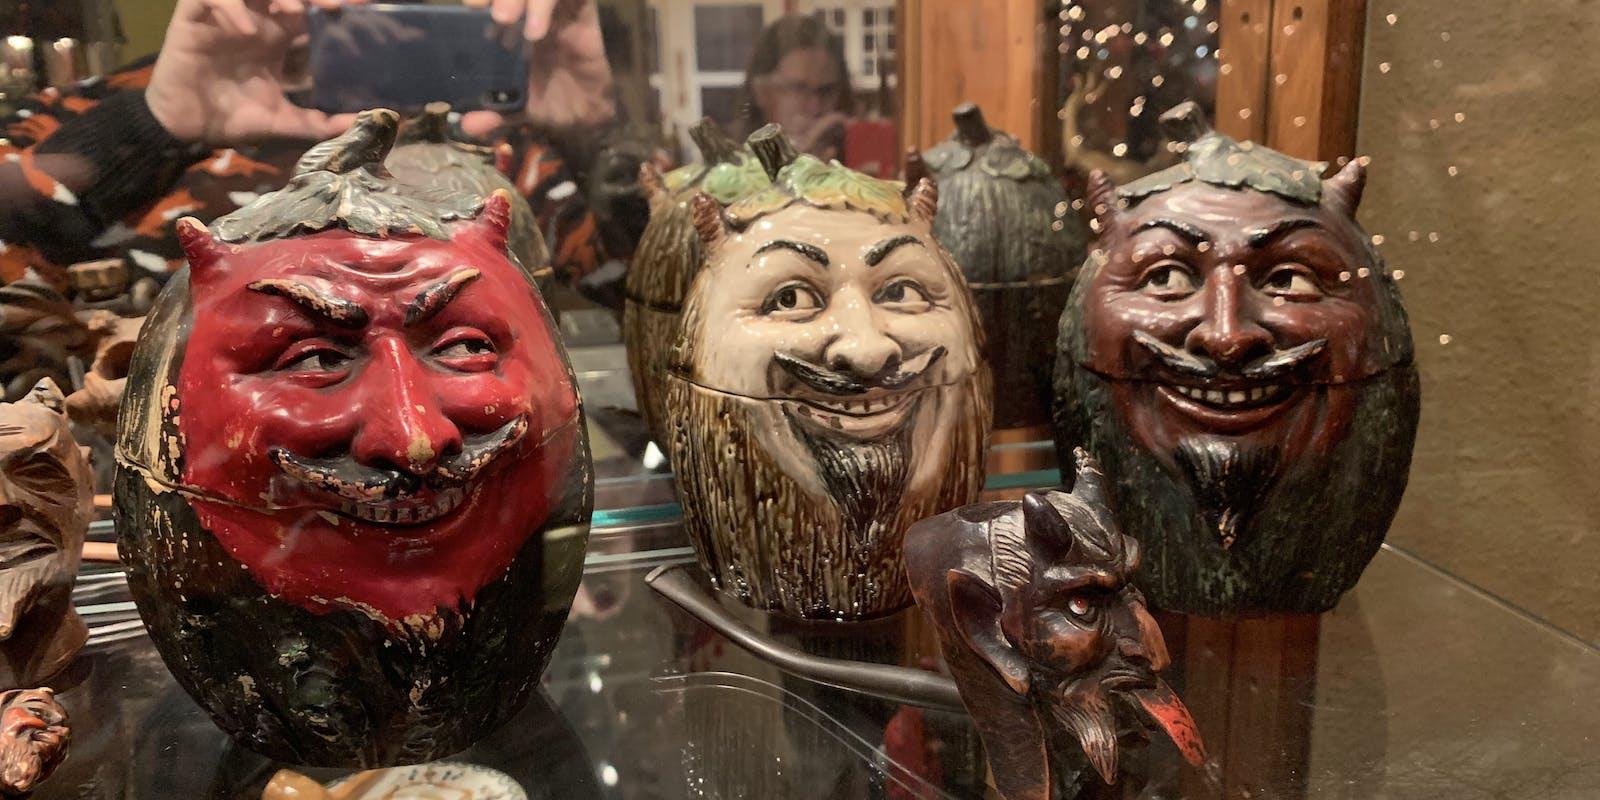 A trio of devilish mugs.